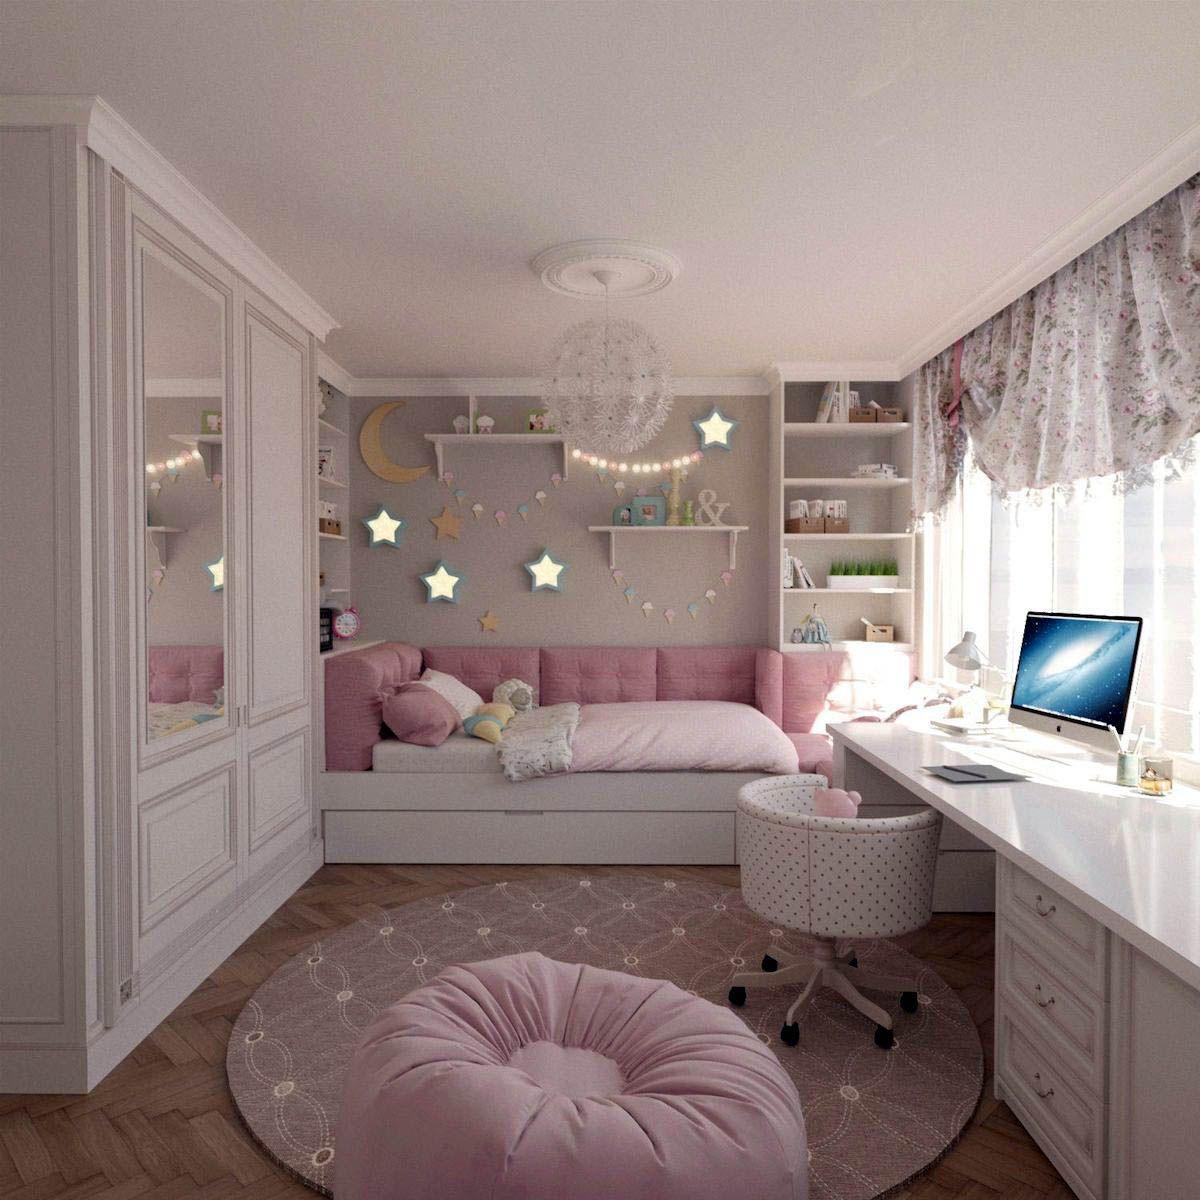 How To Decorate A Kid Boy Bedroom Ideas That Will Blow Your Mind Idei Ukrasheniya Spalni Devchachi Komnaty Kvartirnye Idei